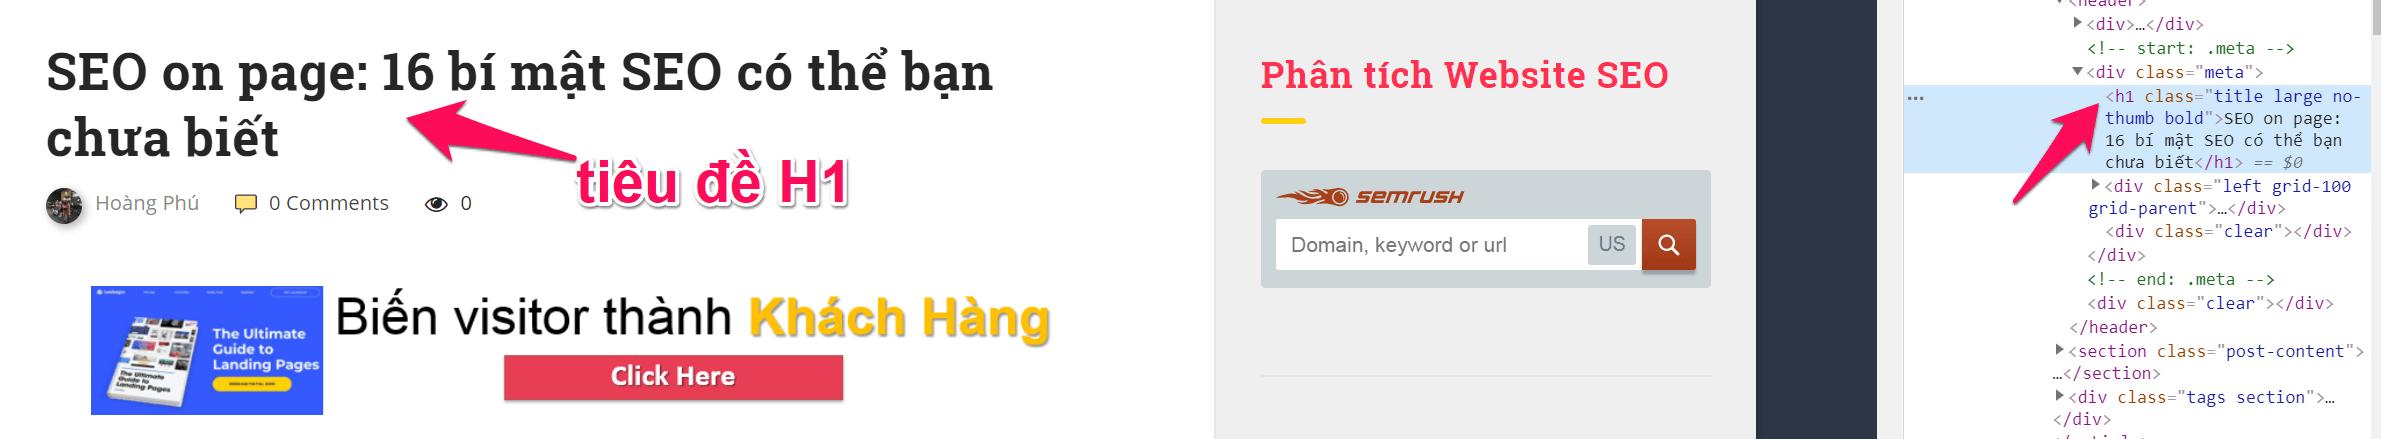 on page seo tiêu đề H1